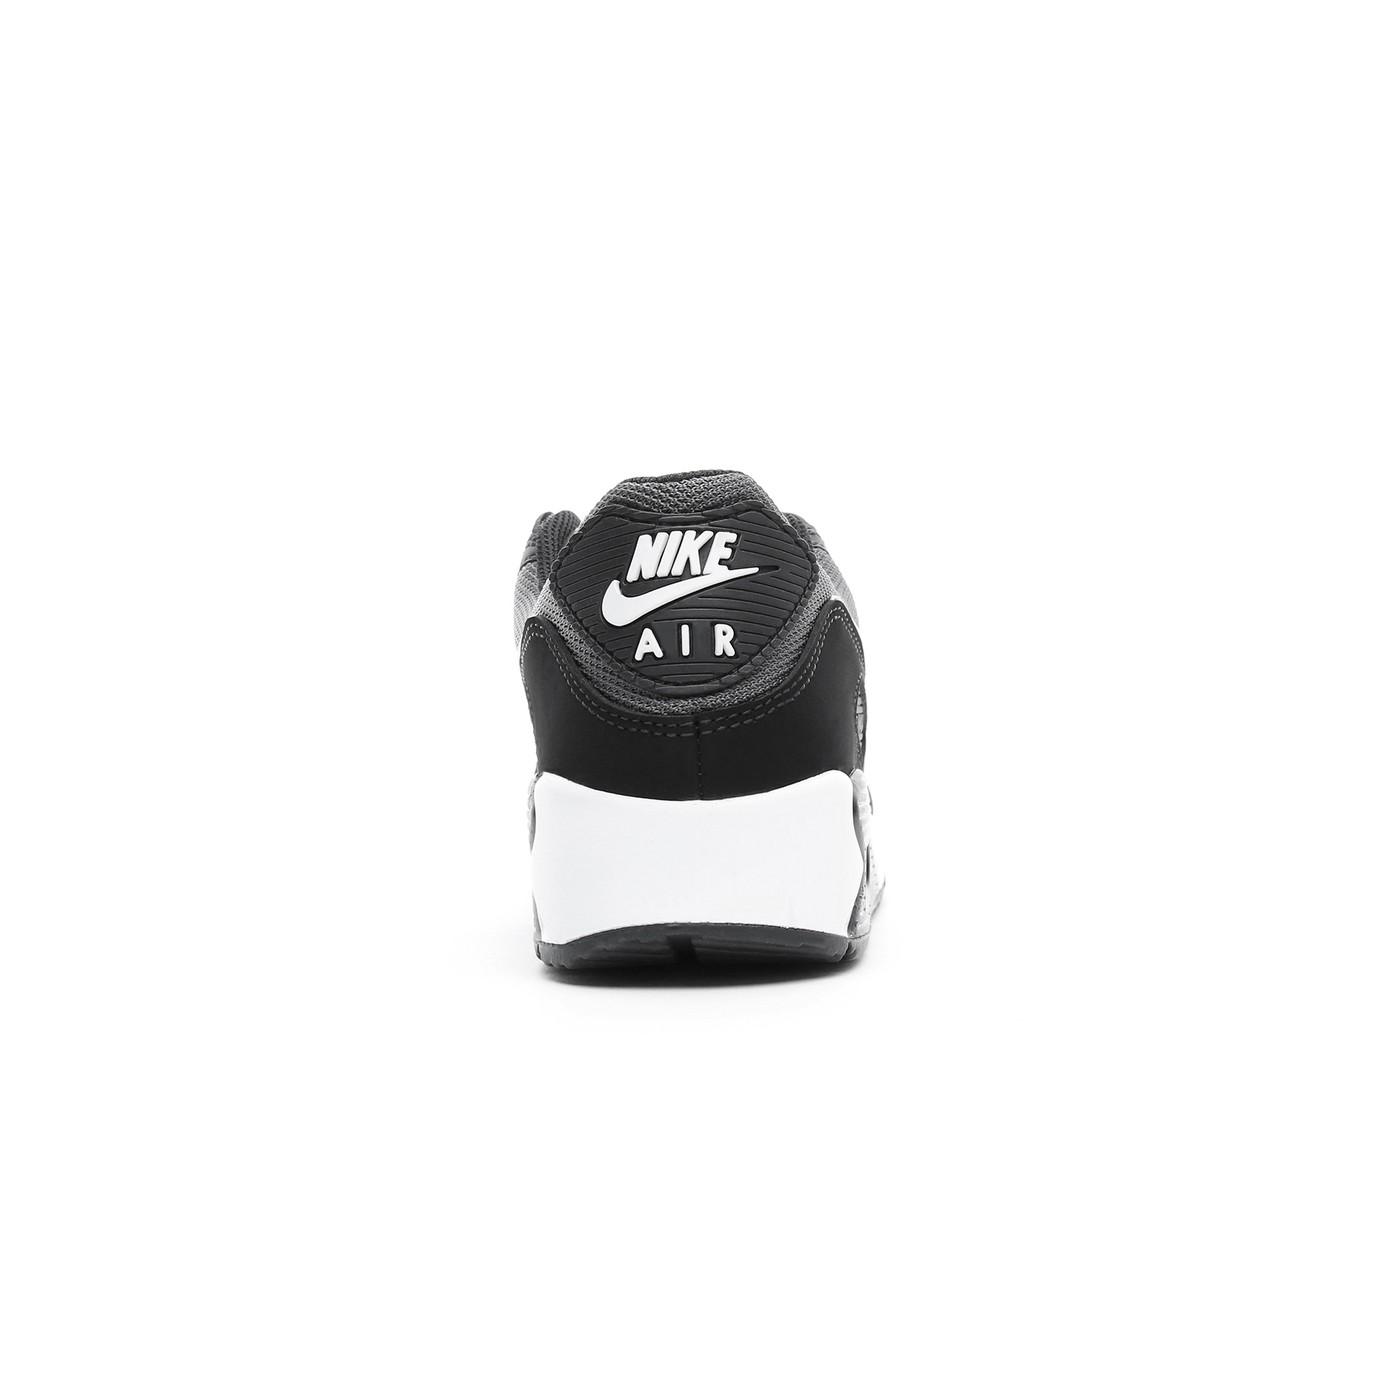 Nike Air Max 90 Erkek Siyah Spor Ayakkabı